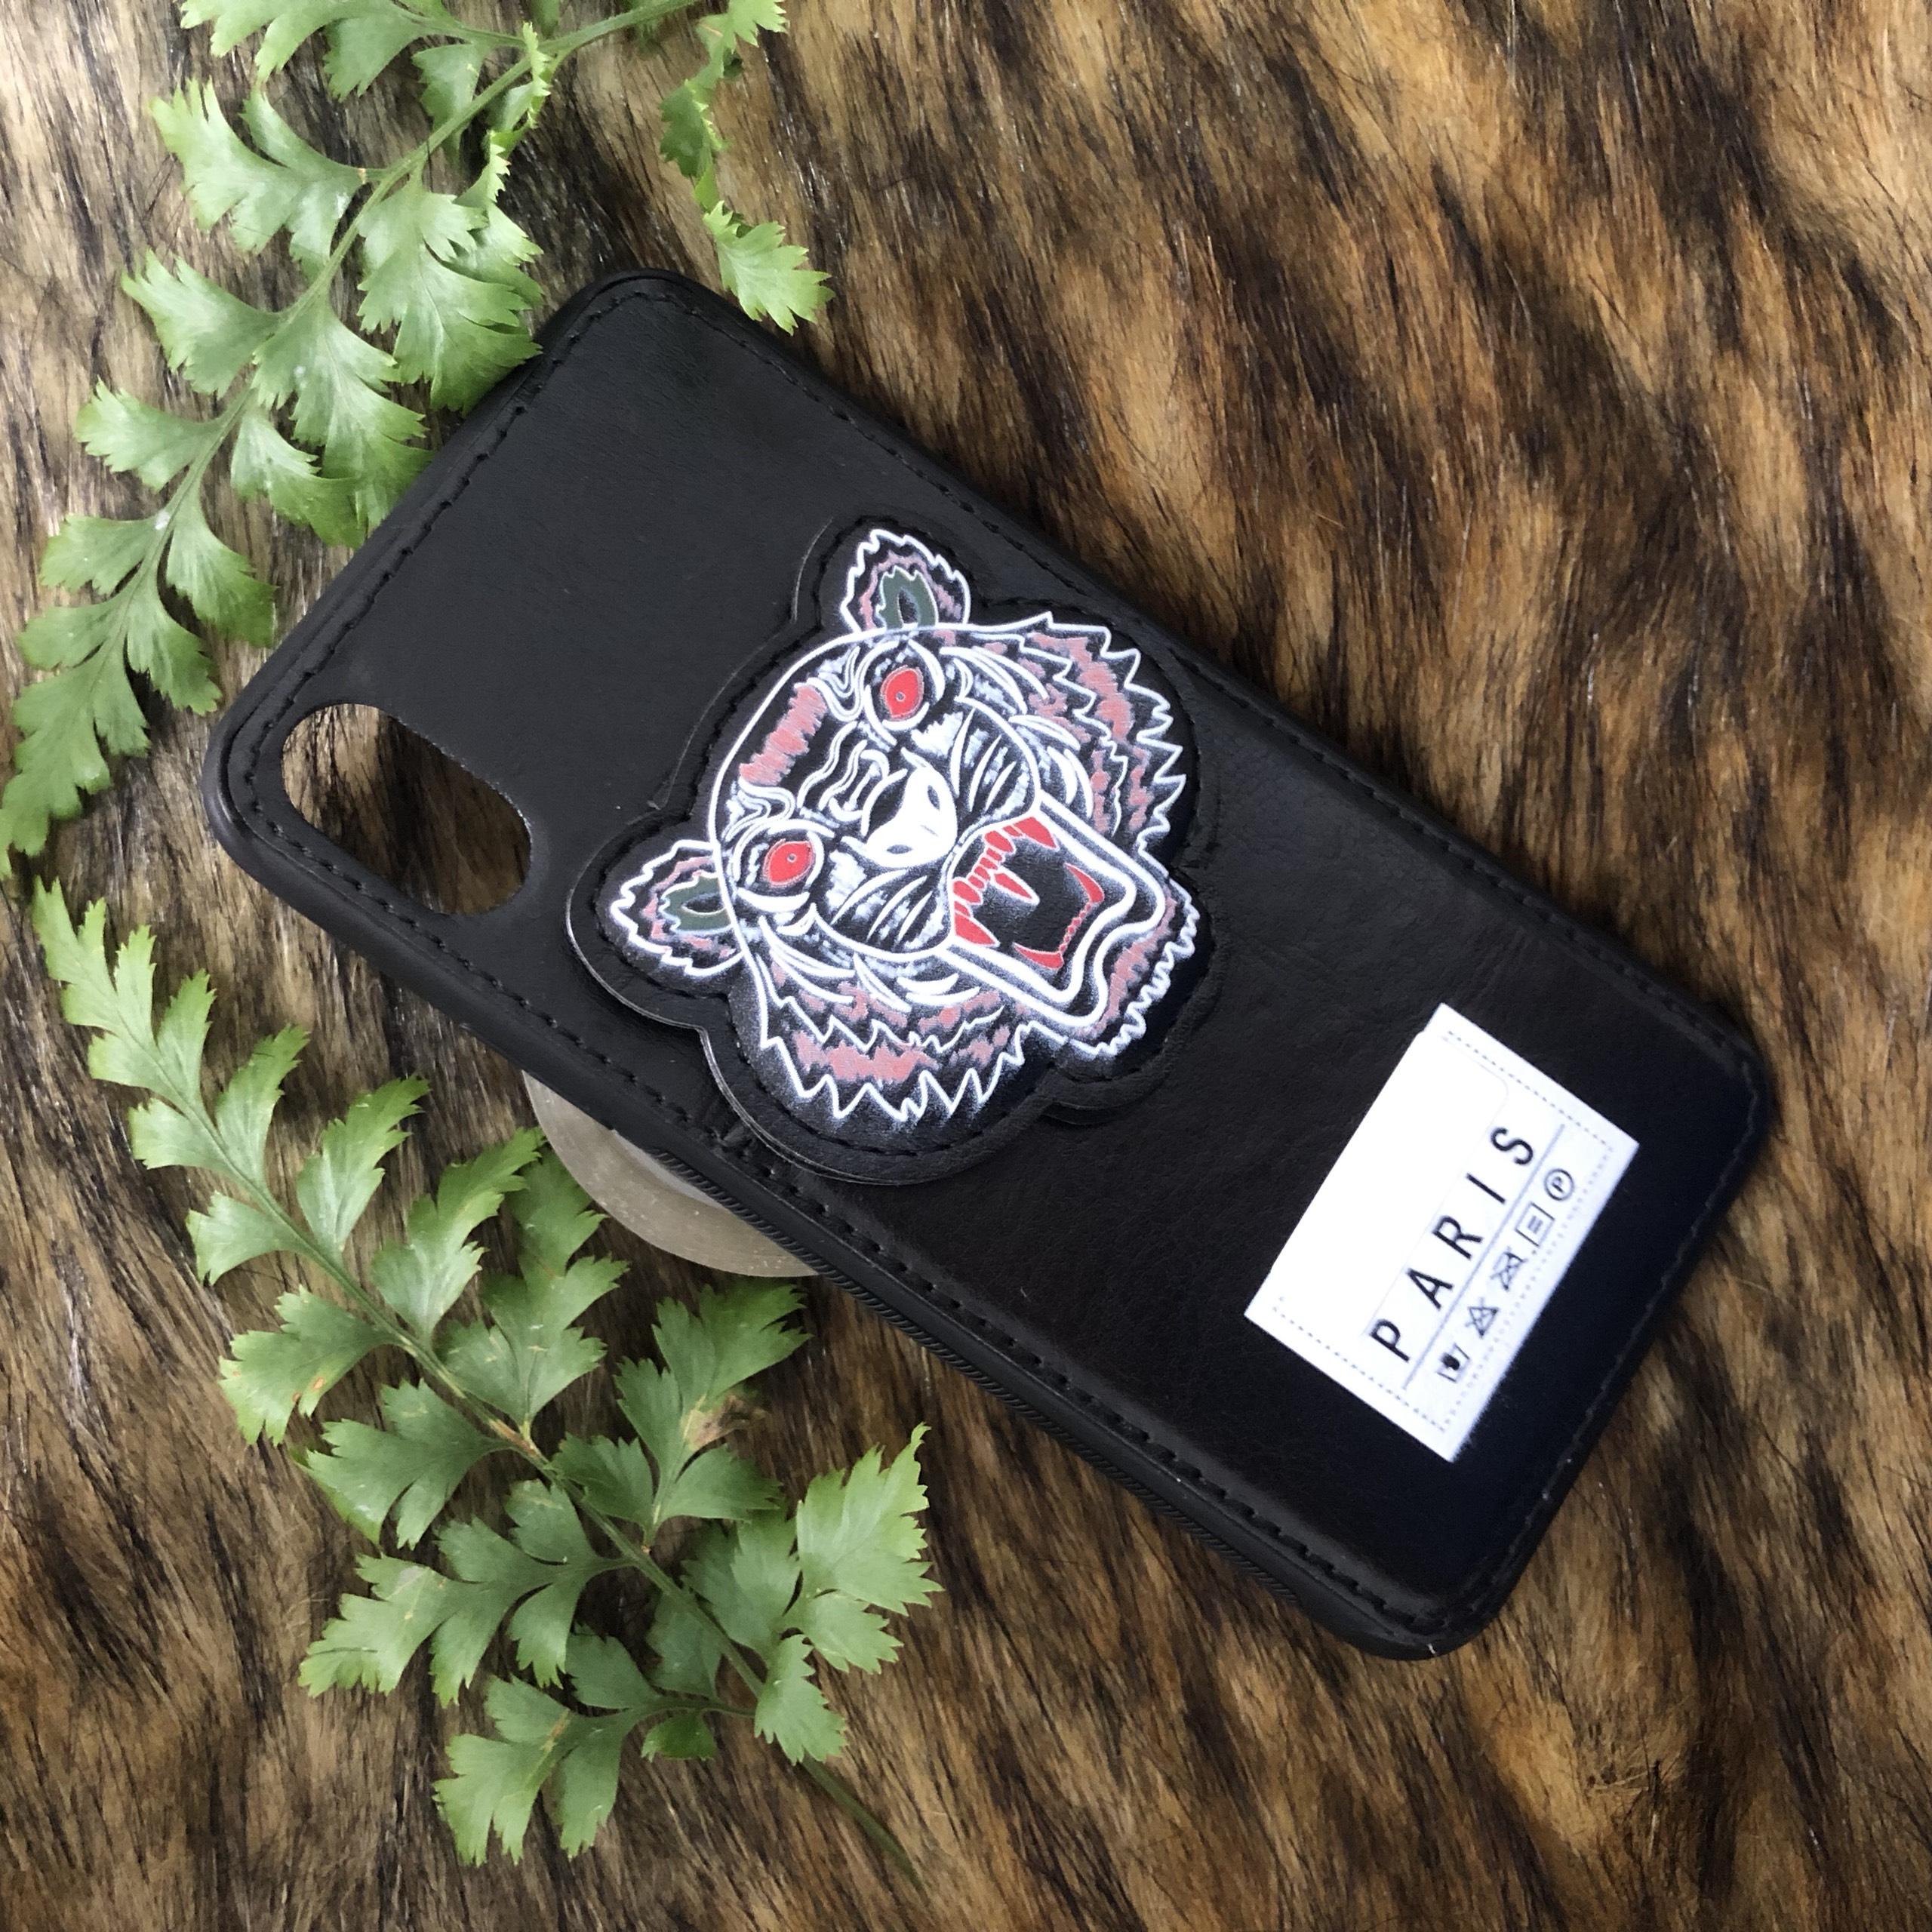 Ốp Da Hình Nổi Dành Cho Iphone - Mẫu 4